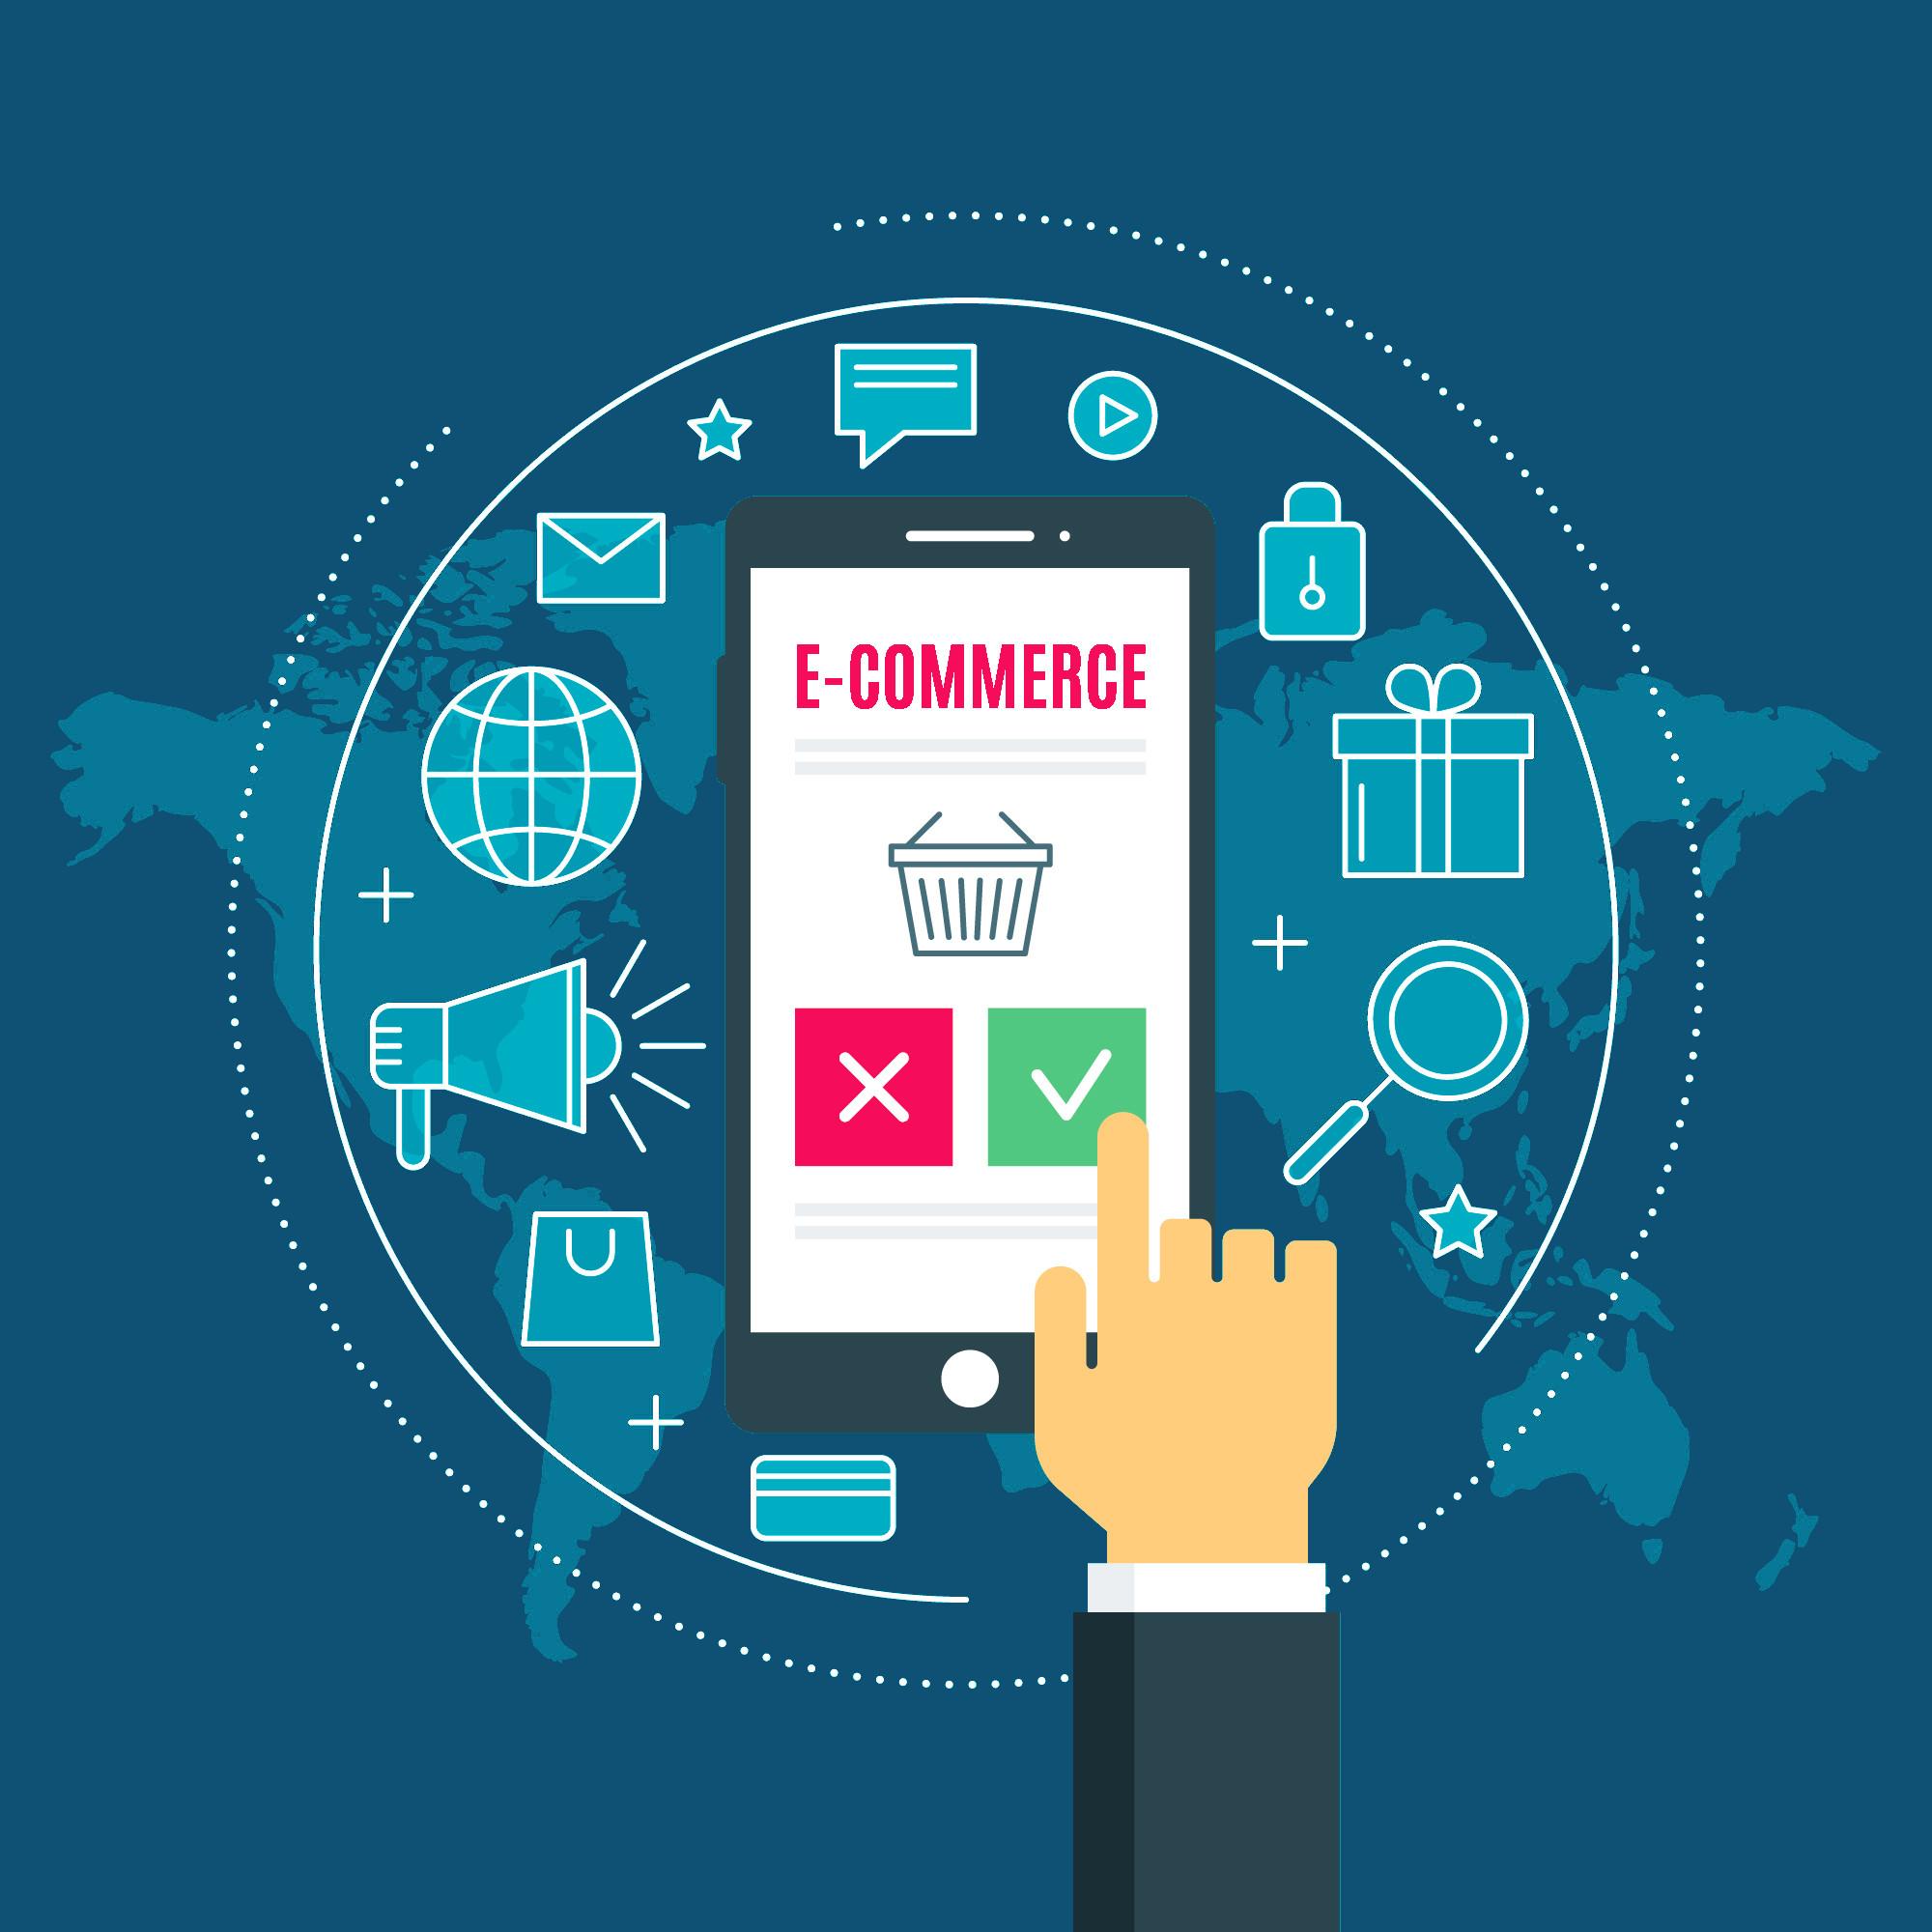 platataformas para ecommerce